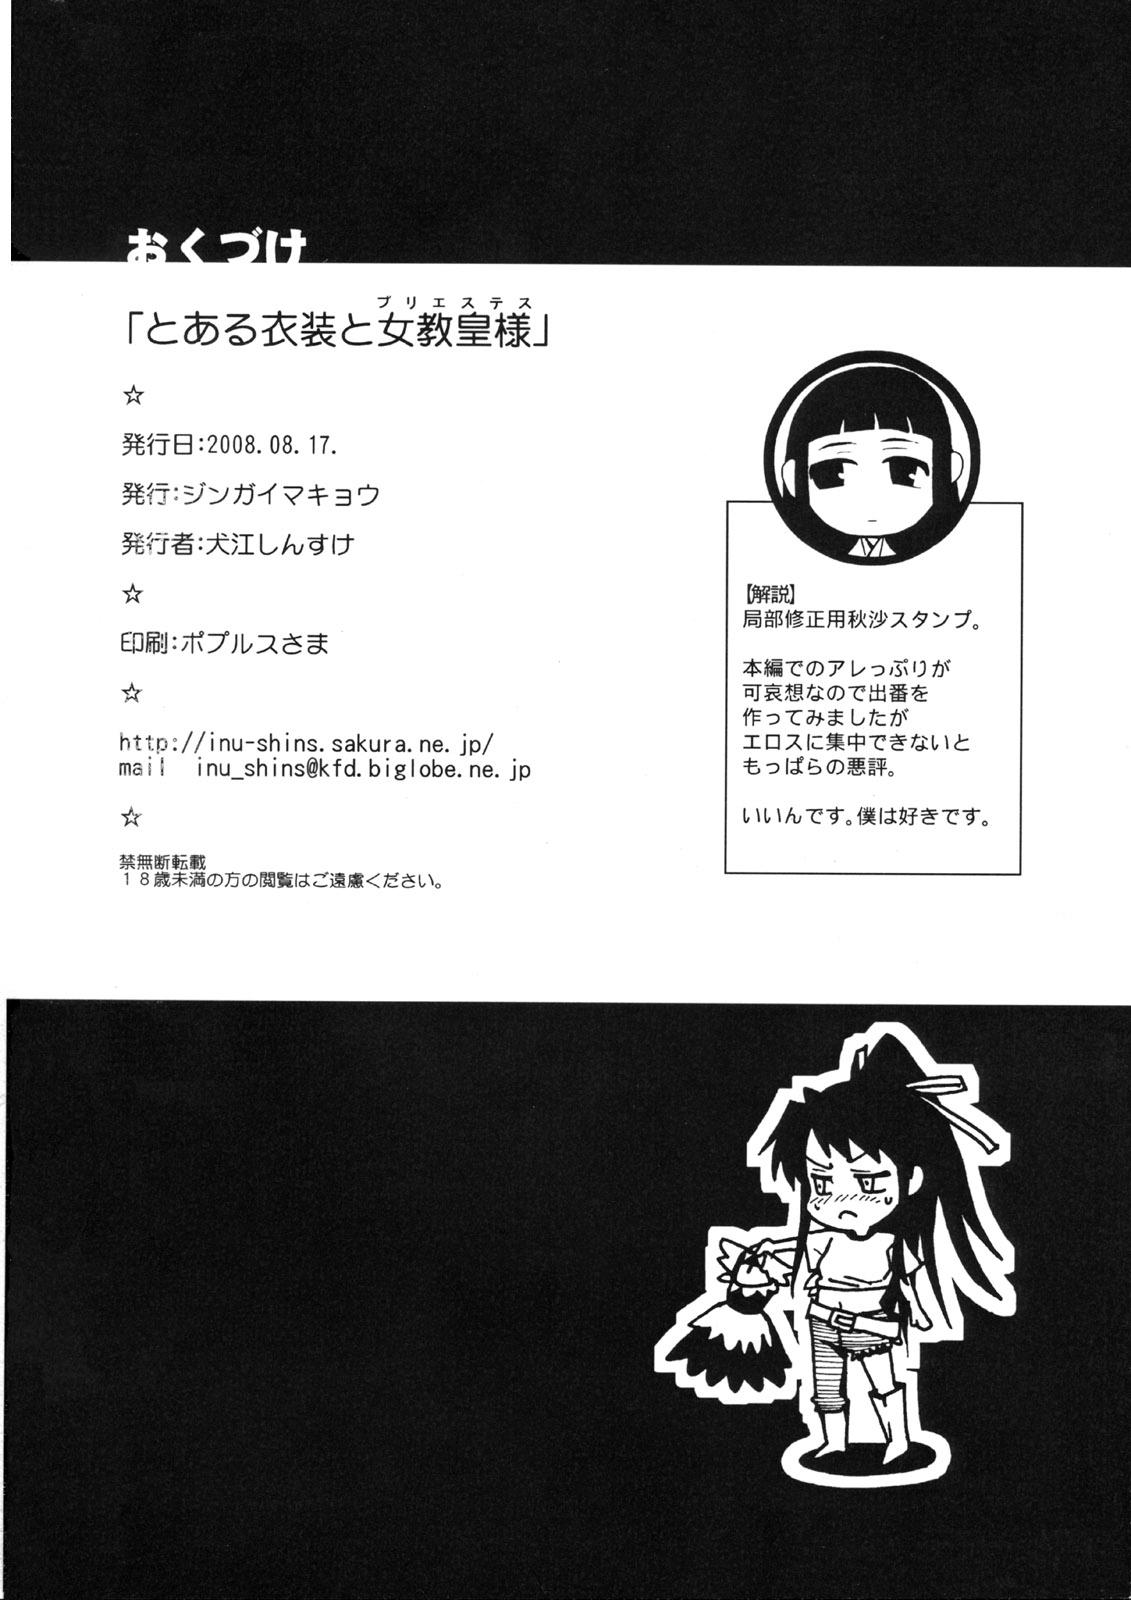 rokudenashi records to koushi akashic majutsu re=l American dad steve and hayley porn